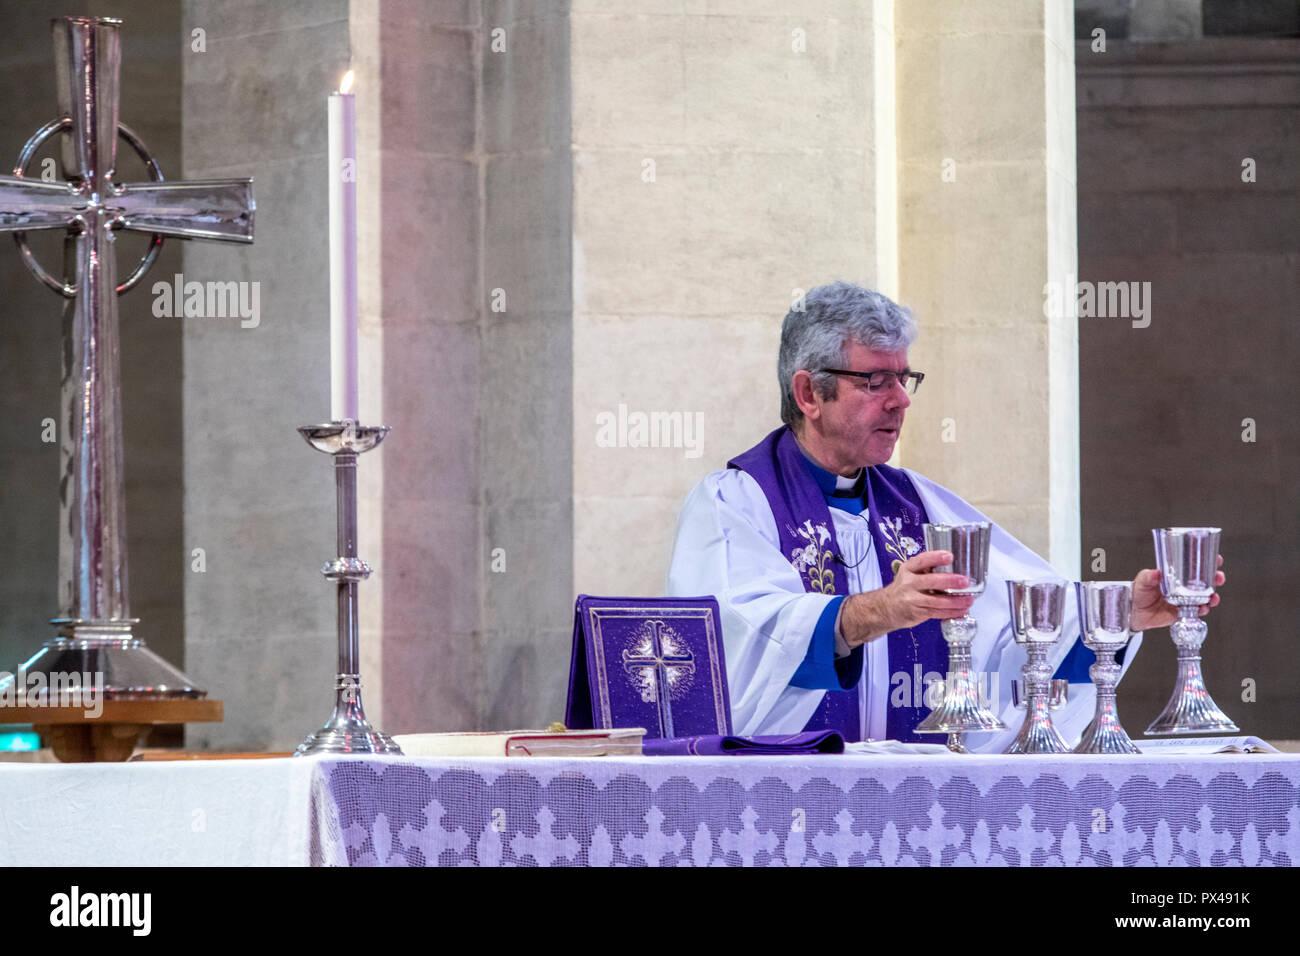 Belfast protestant cathedral, Northern Ireland. Eucharist celebration. Ulster, U.K. - Stock Image